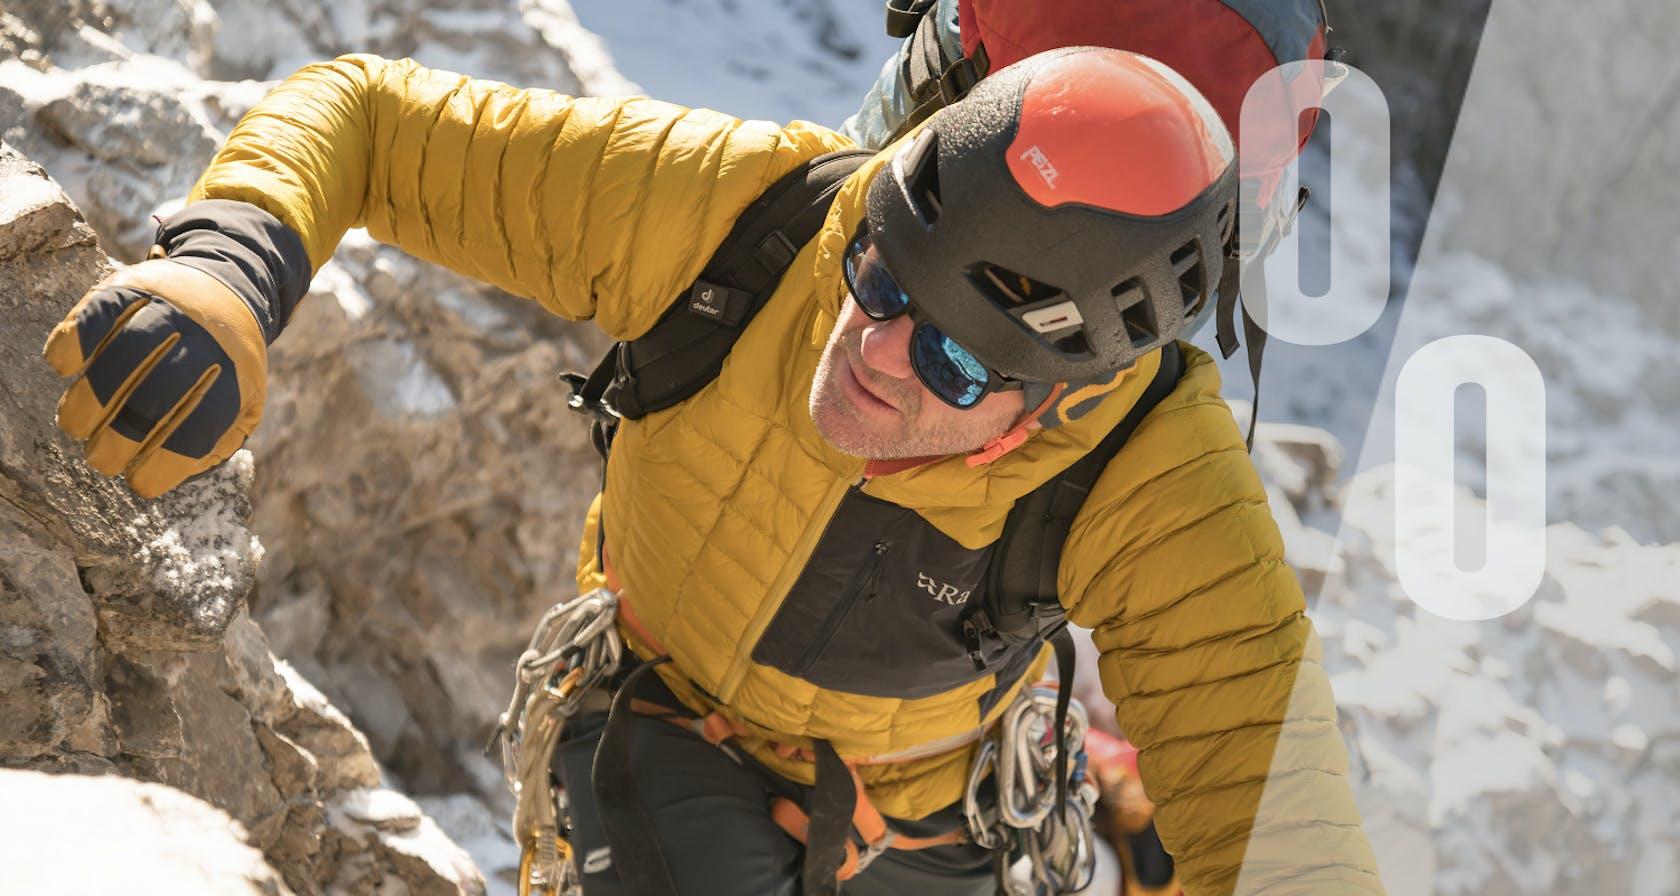 saldi alpinismo